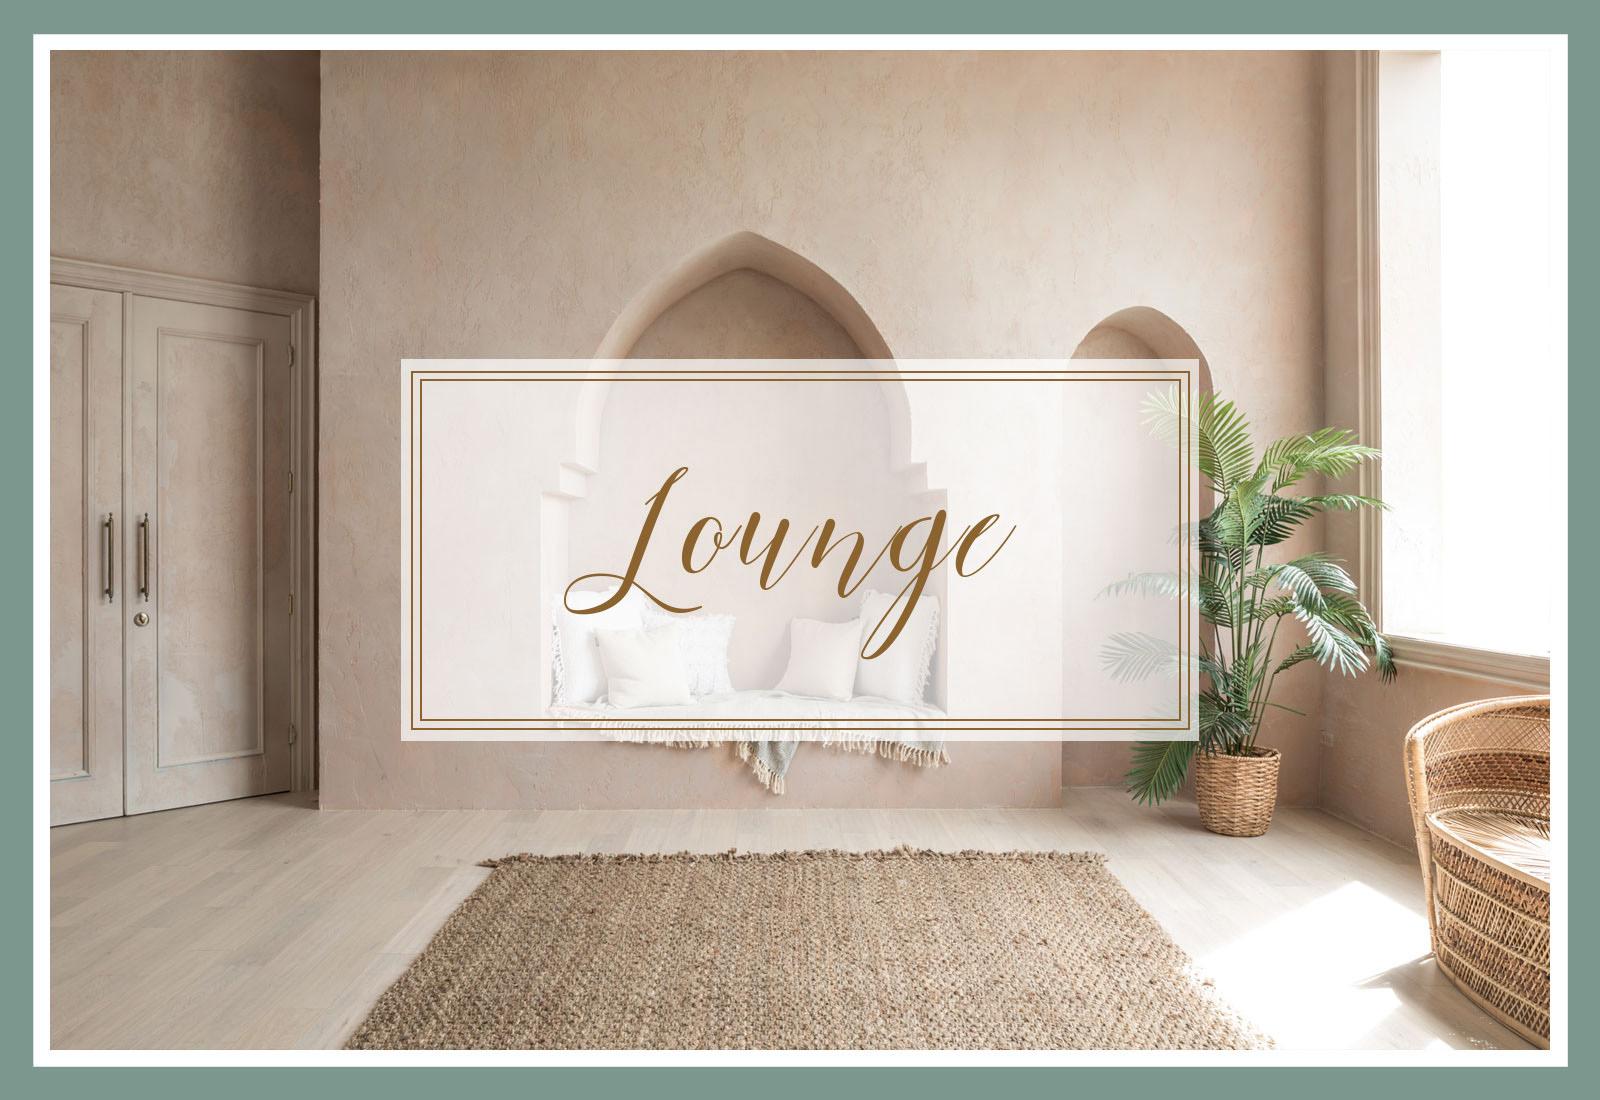 Lounge Studio navigation